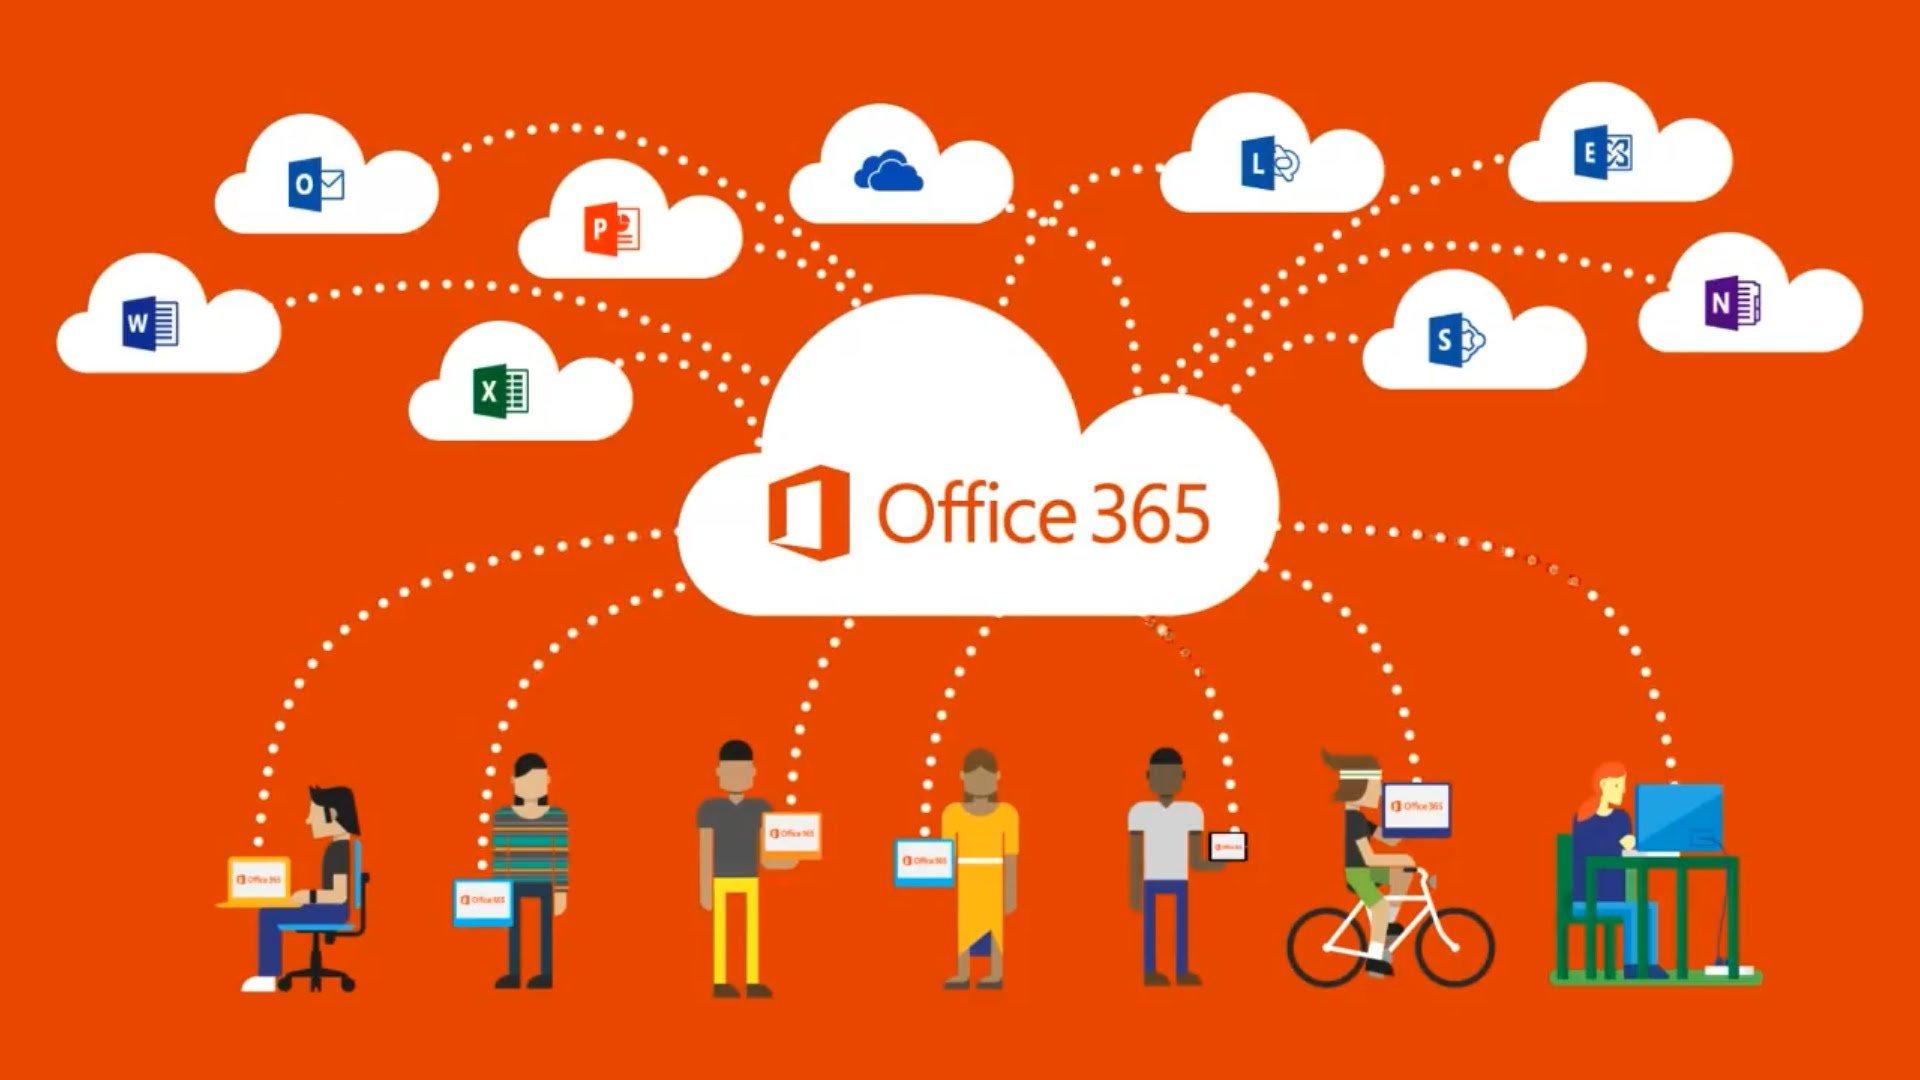 Features & Benefits of Microsoft Office 365 - MyVenturePad.com